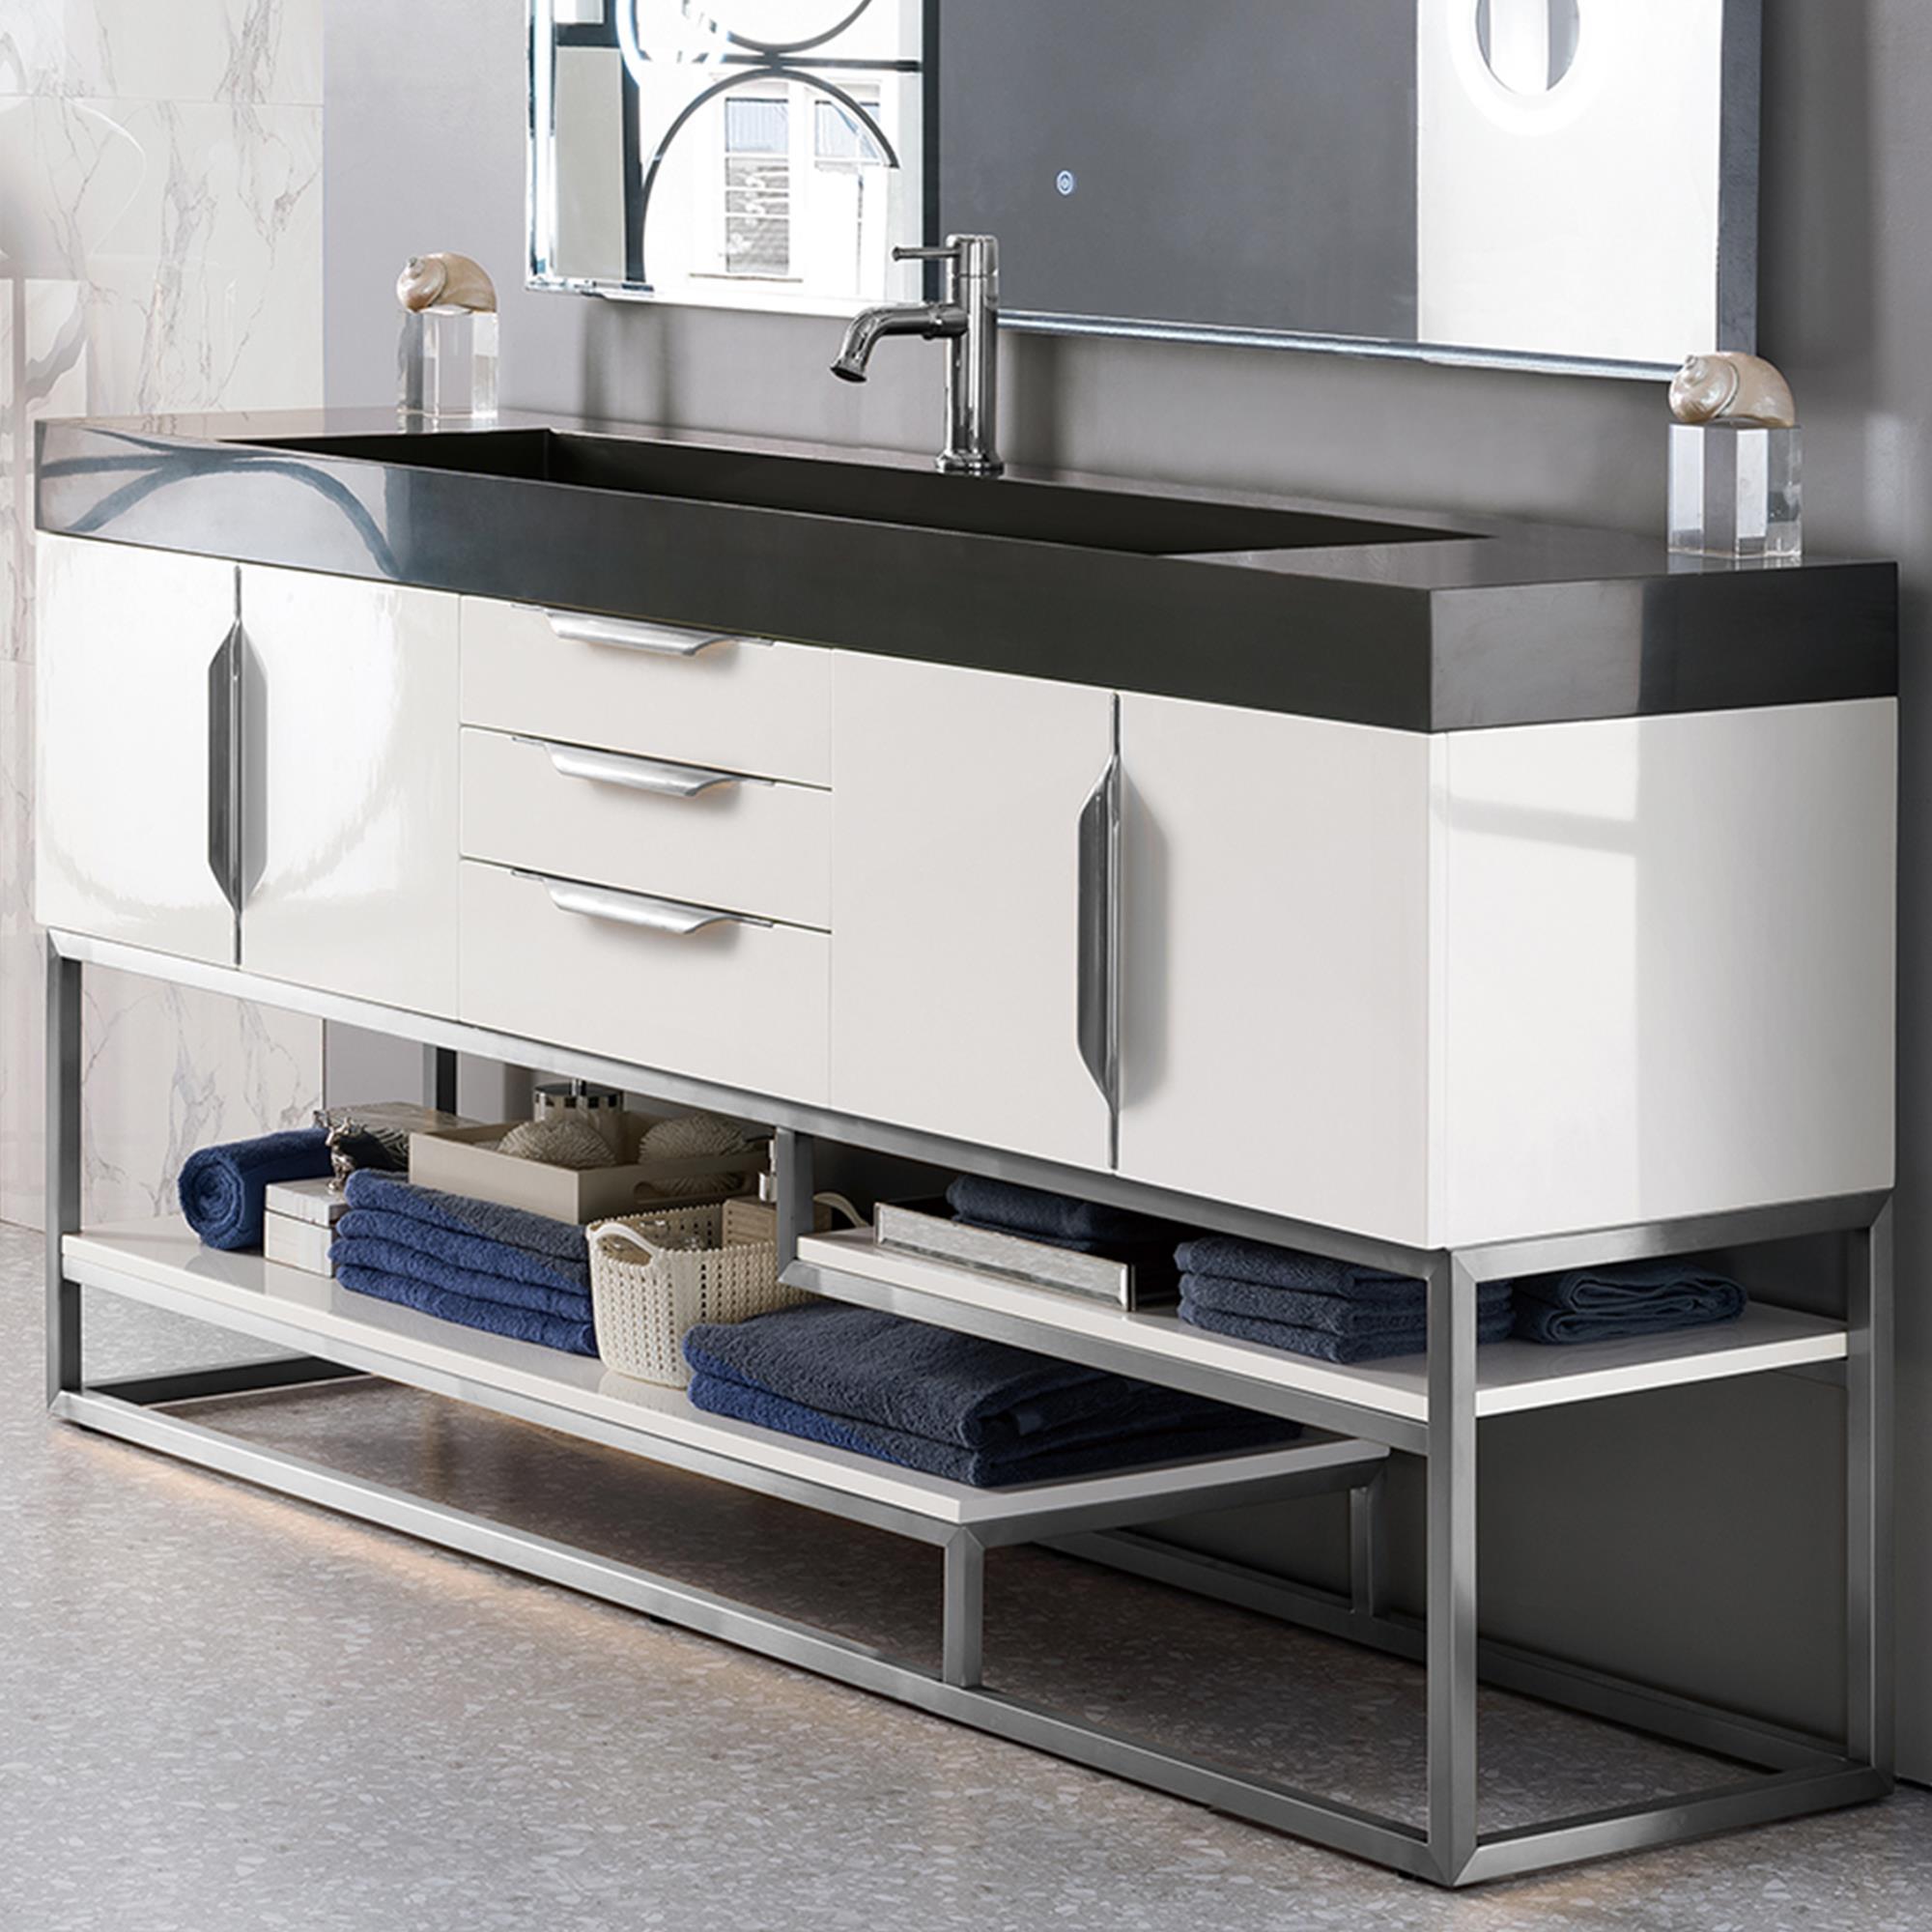 James Martin Columbia 72 Single Bathroom Vanity Cabinet In Glossy White And Brushed Nickel Nebraska Furniture Mart